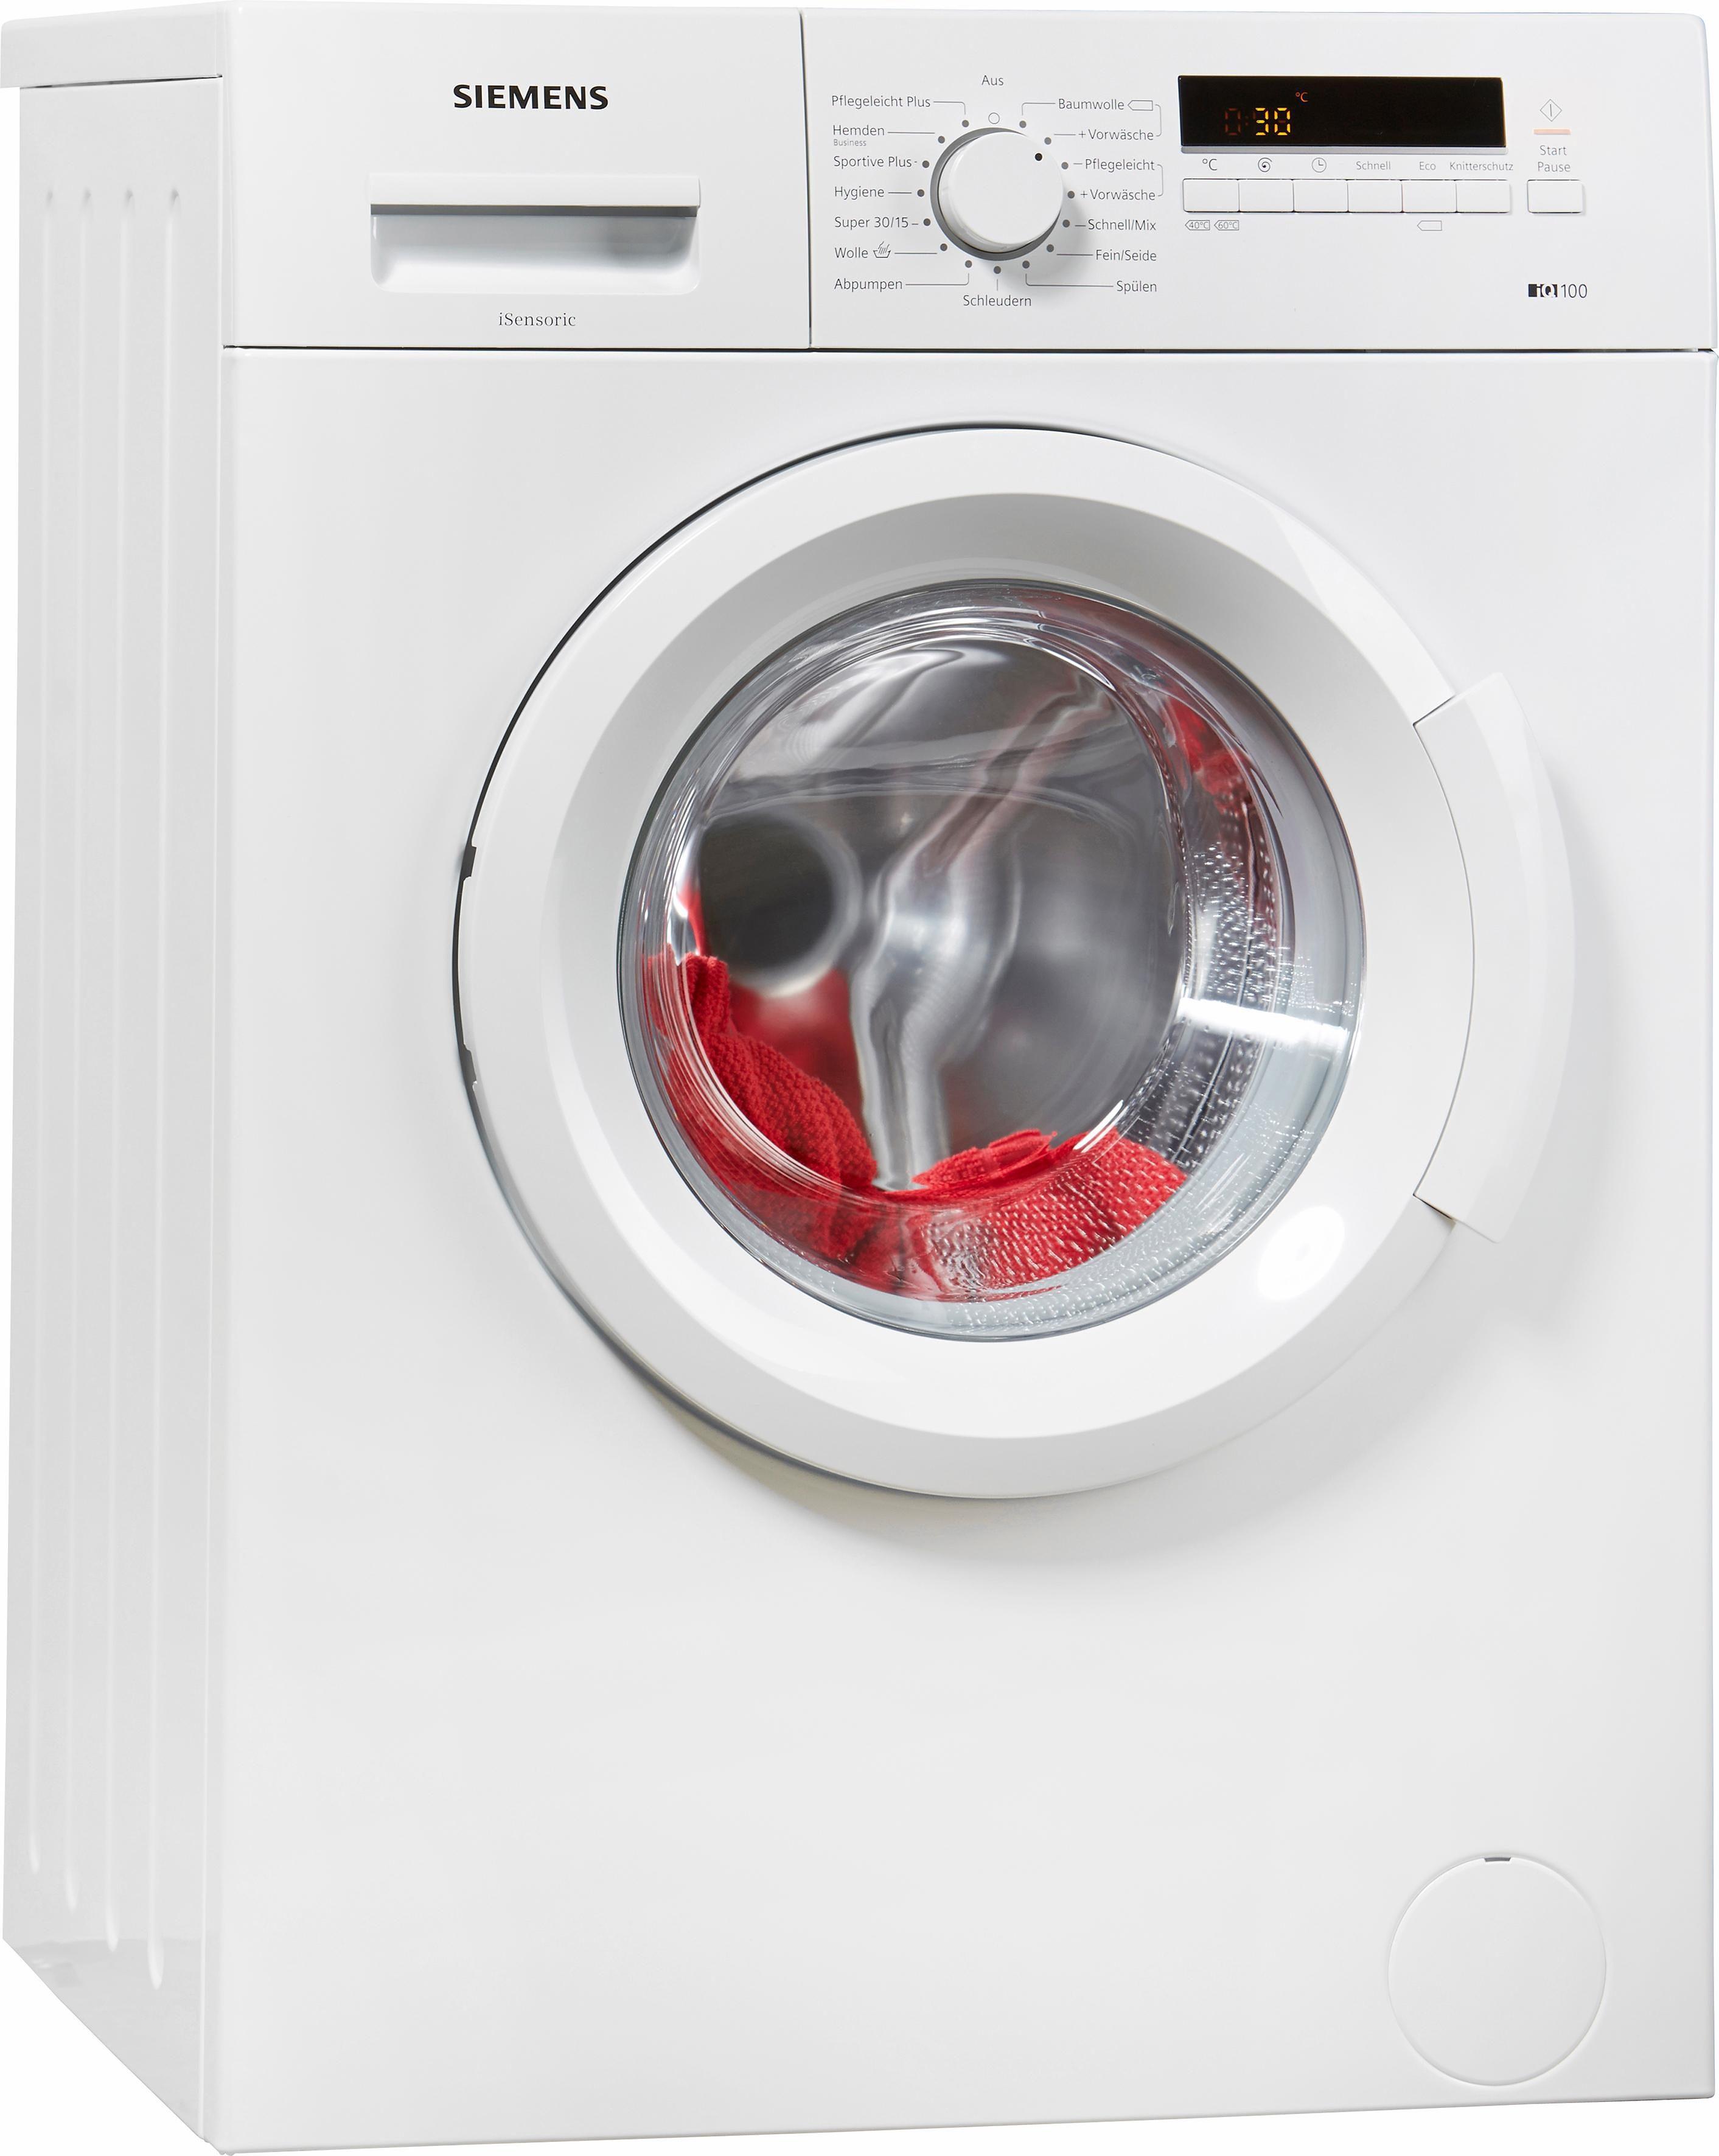 SIEMENS Waschmaschine iQ100 WM14B222, A+++, 6 kg, 1400 U/Min